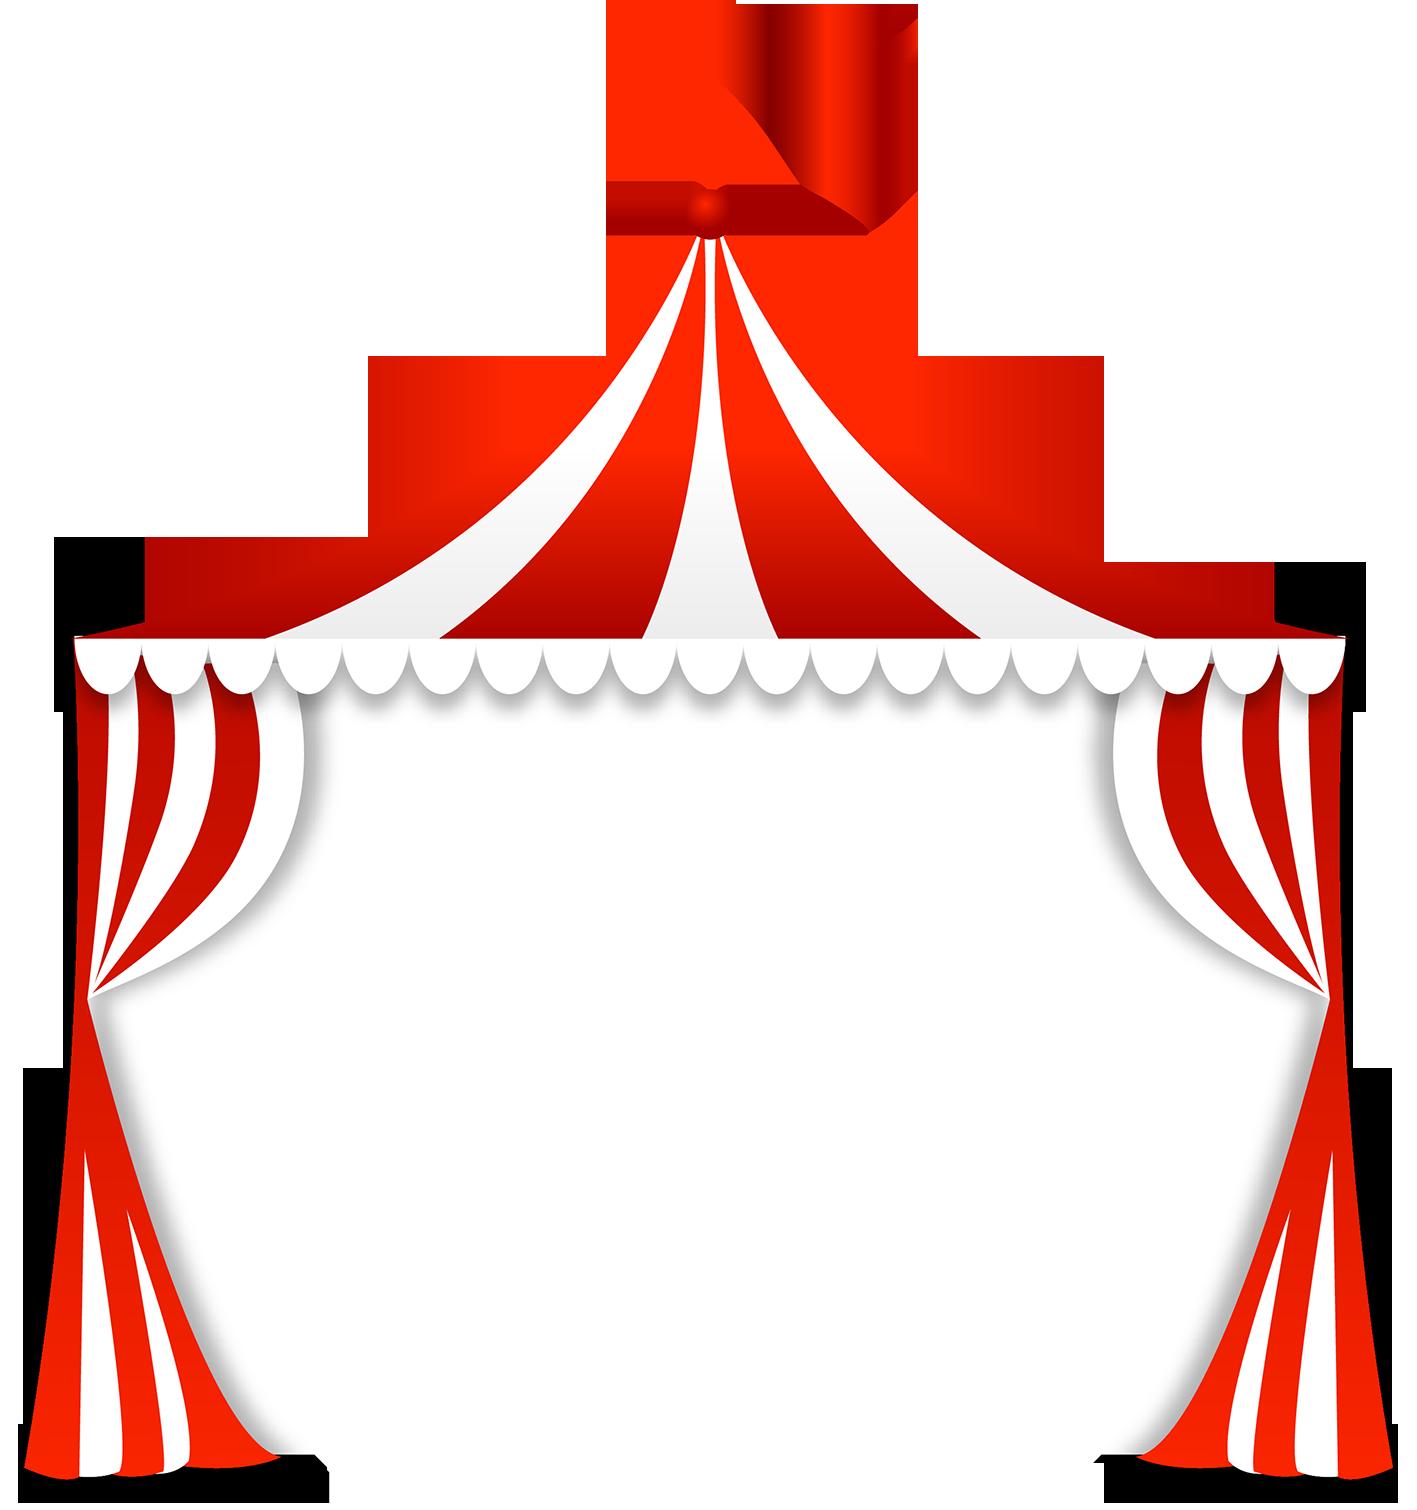 svg download Molduras em png tema. Carnival ticket booth clipart